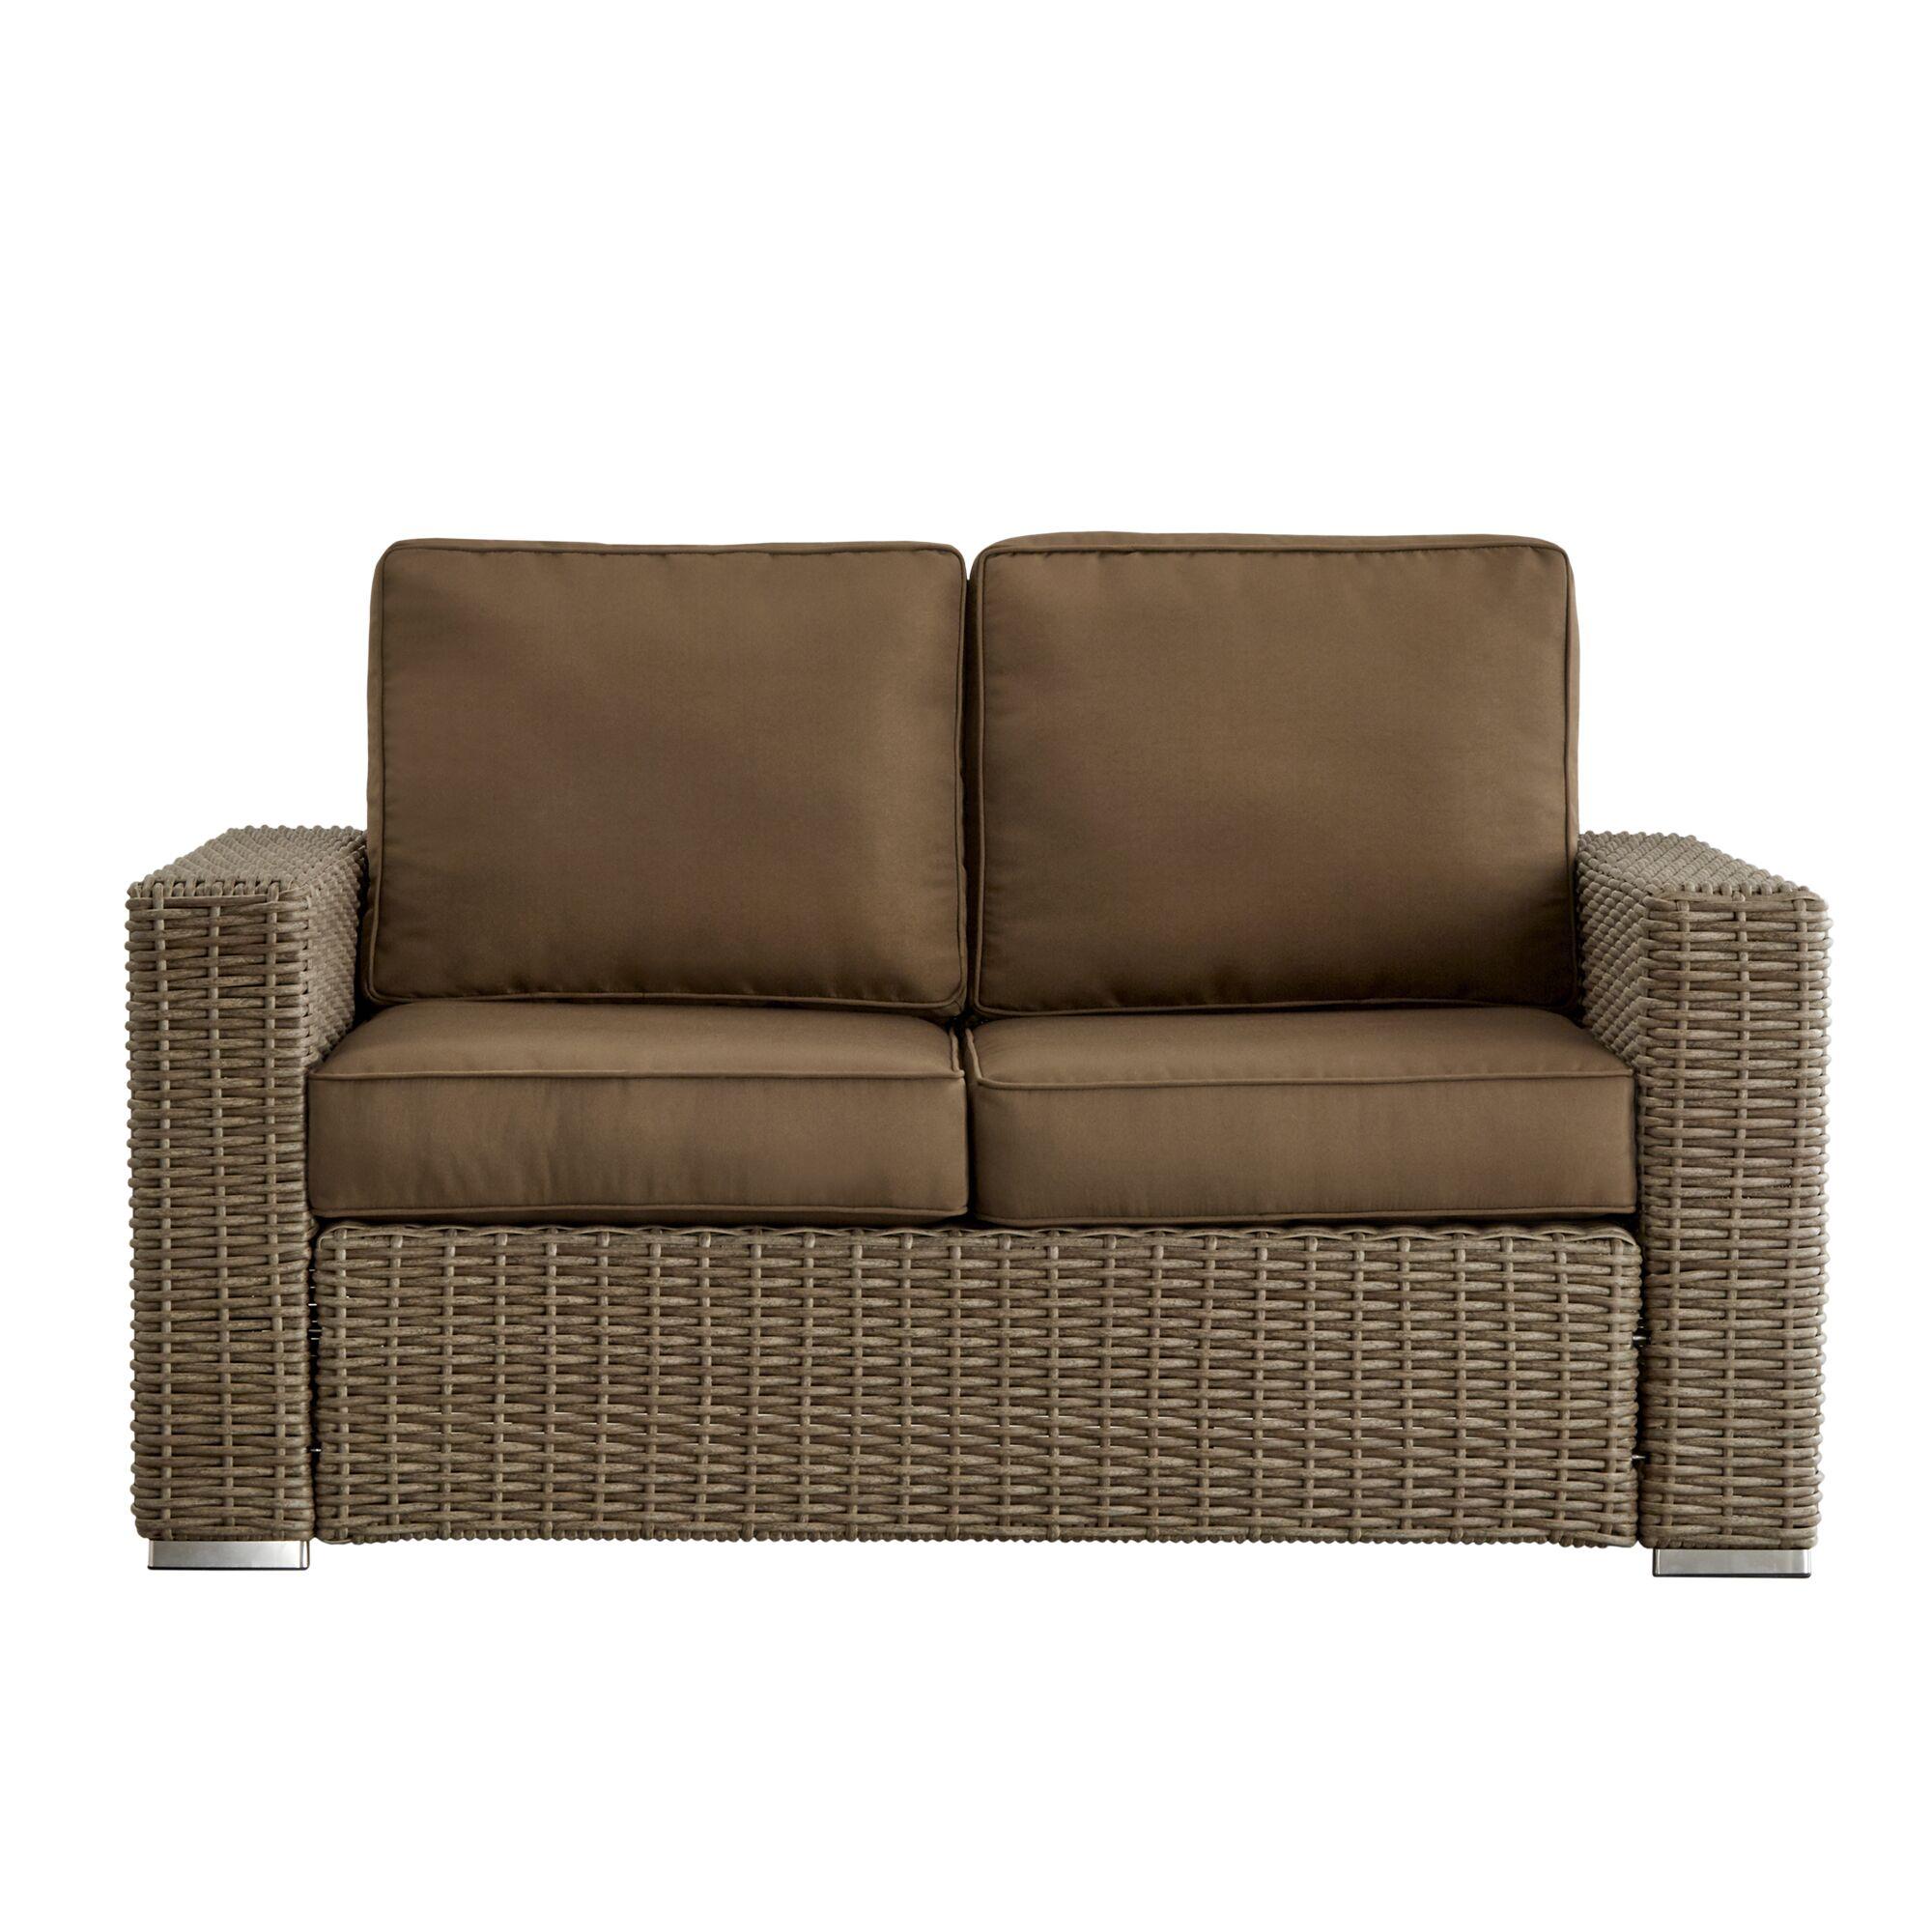 Rathdowney Loveseat with Cushions Fabric: Spa Blue, Finish: Mocha